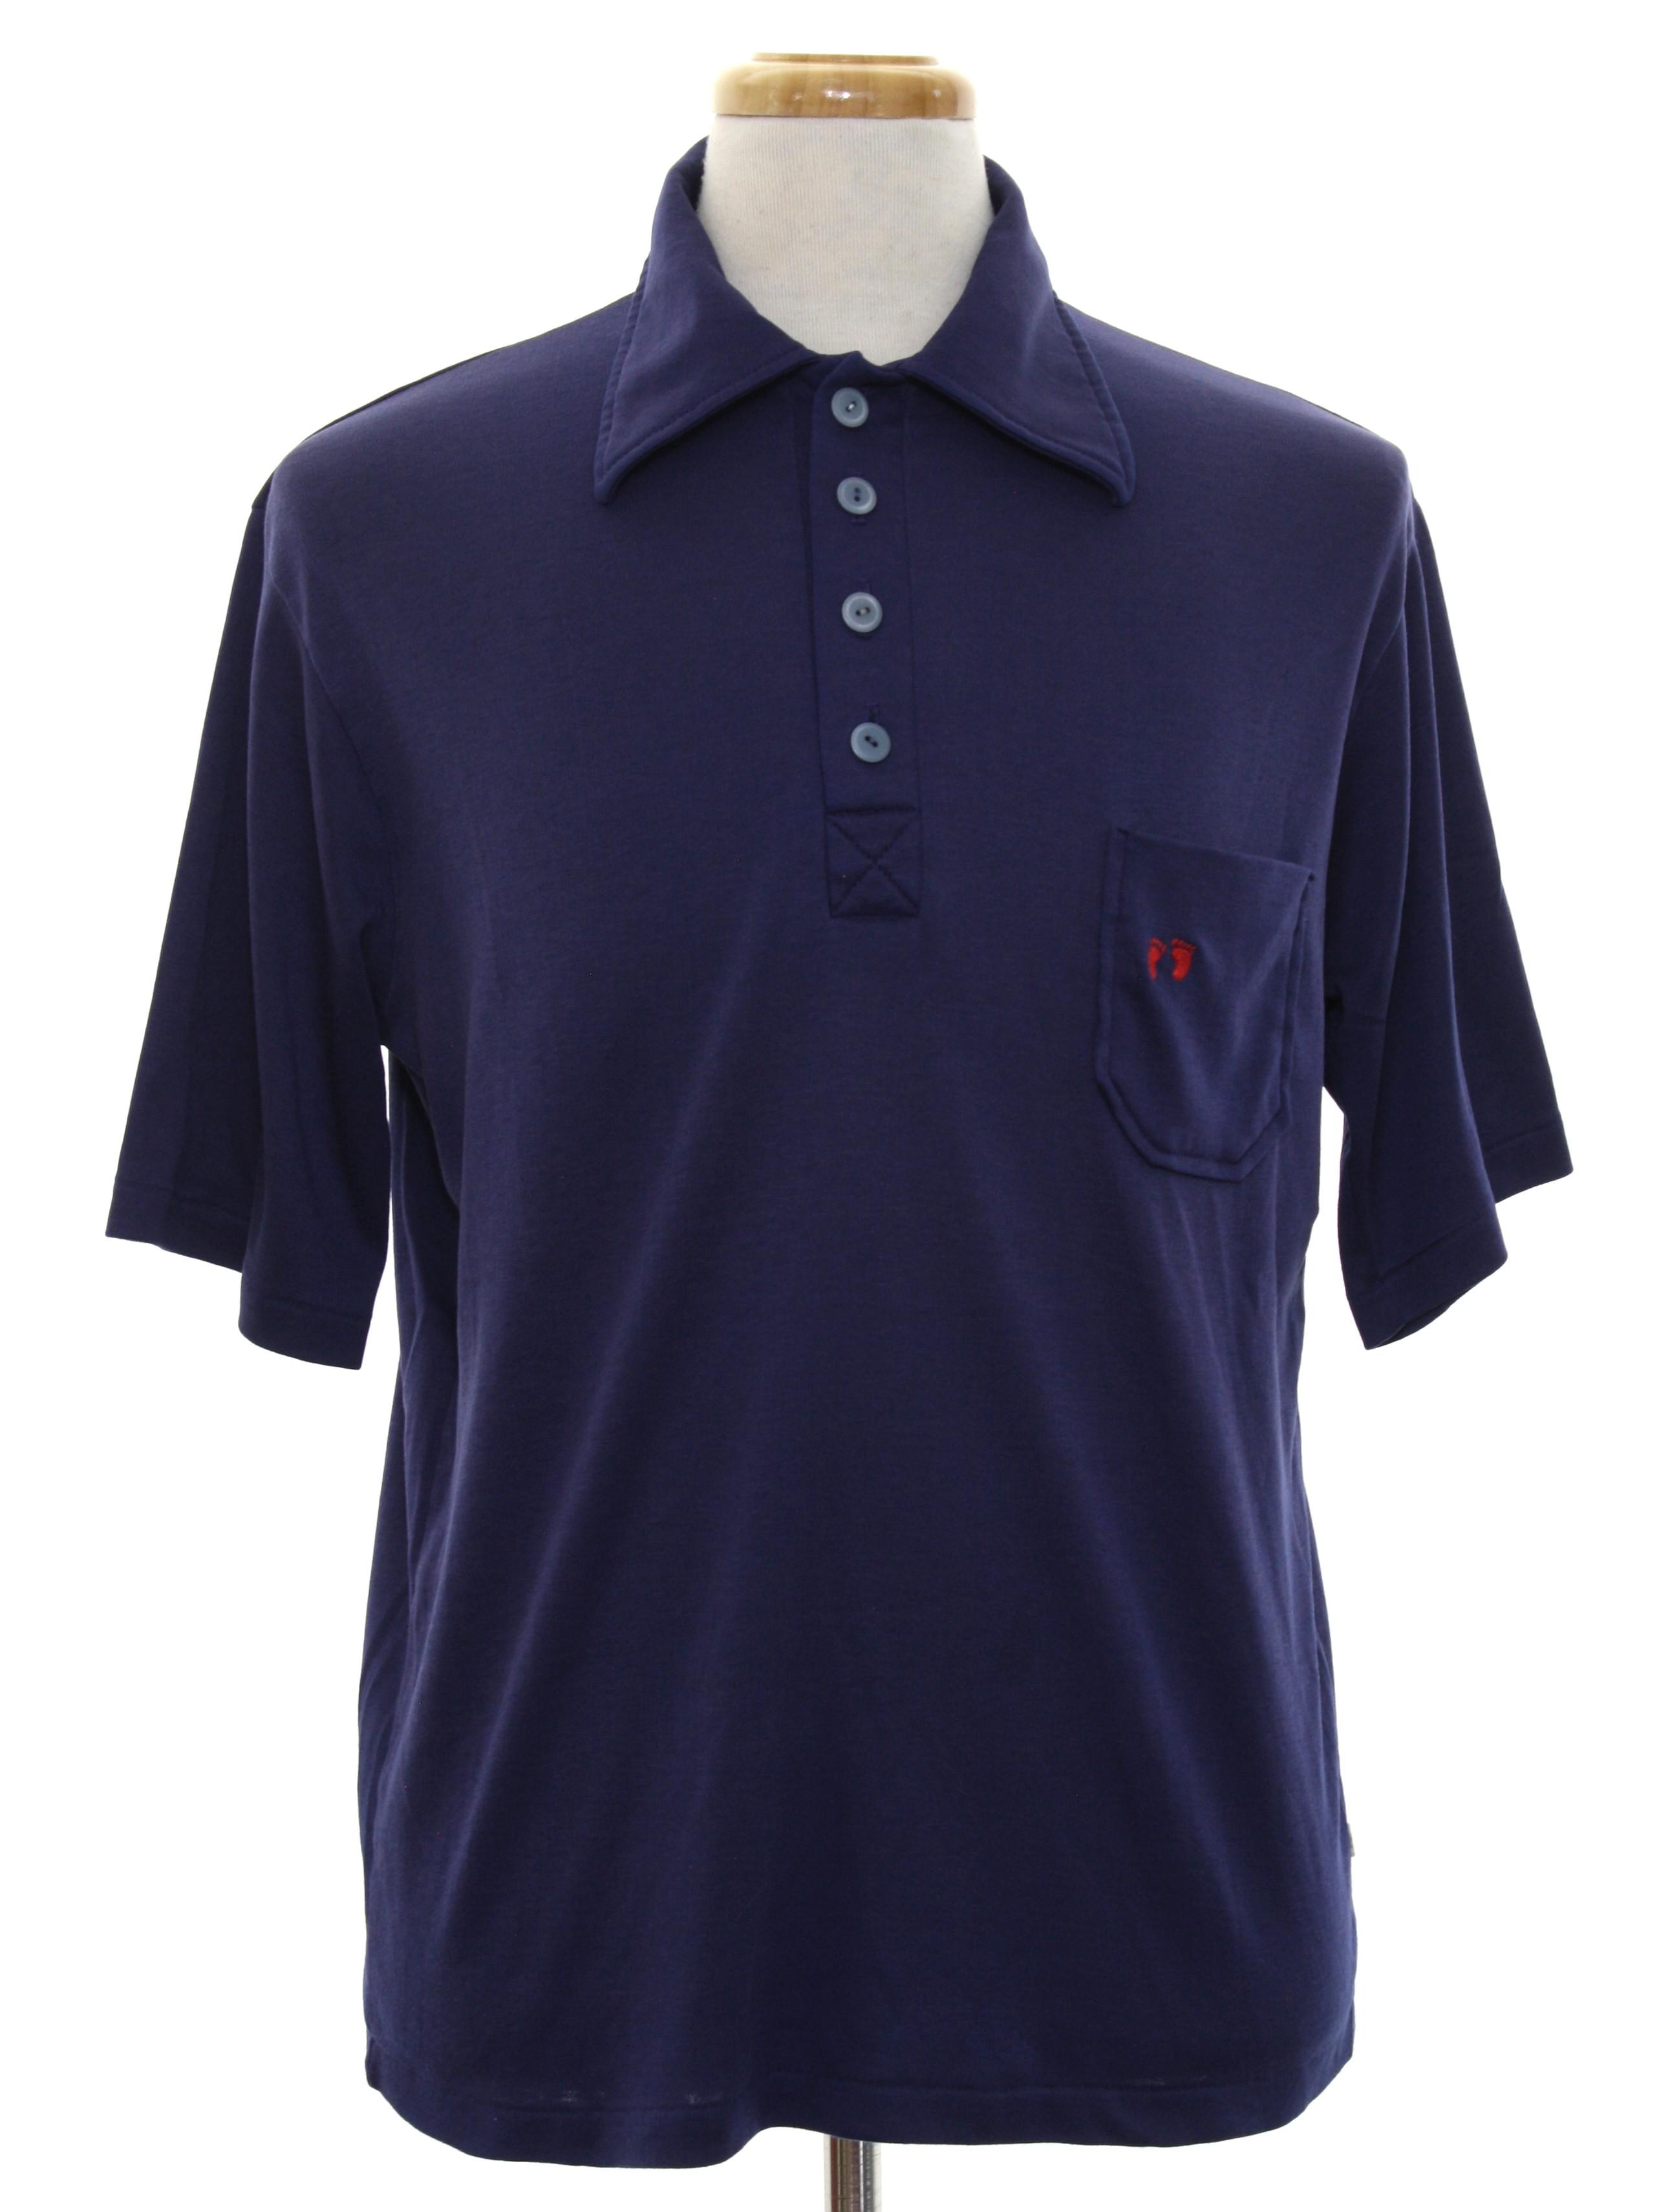 08521276 70s Vintage Hang Ten Shirt: Late 70s or Early 80s -Hang Ten- Mens ...